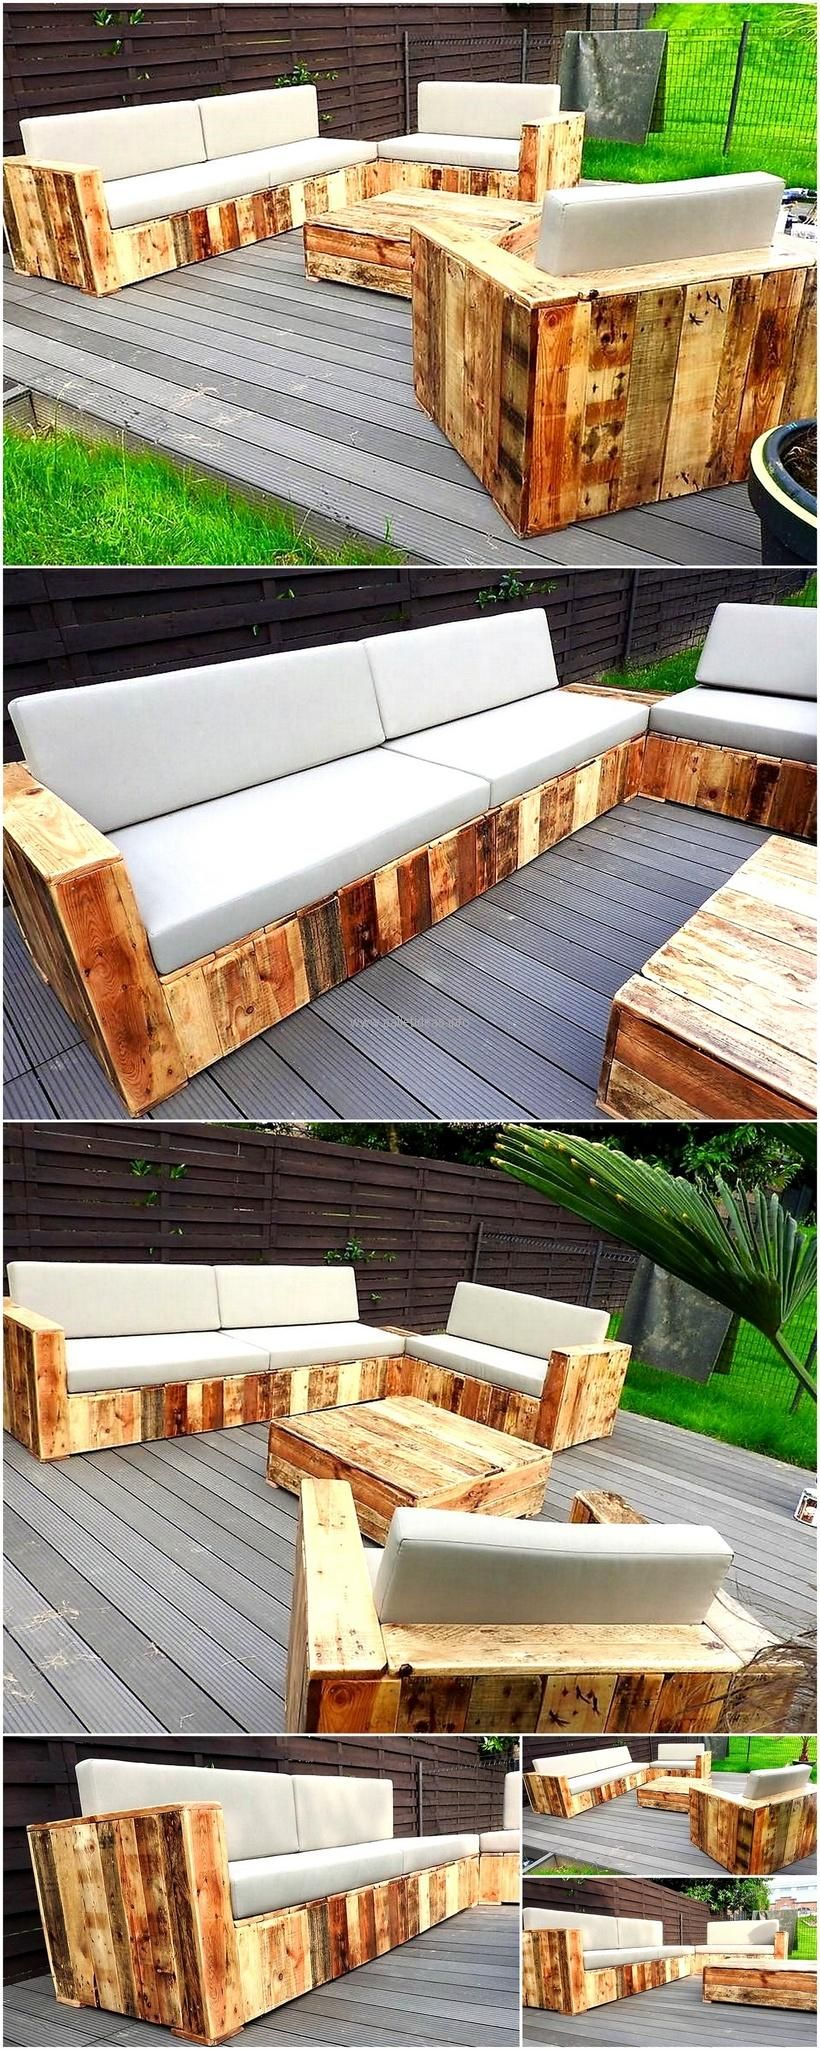 pallet outdoor furniture. Pallet Outdoor Garden Furniture E